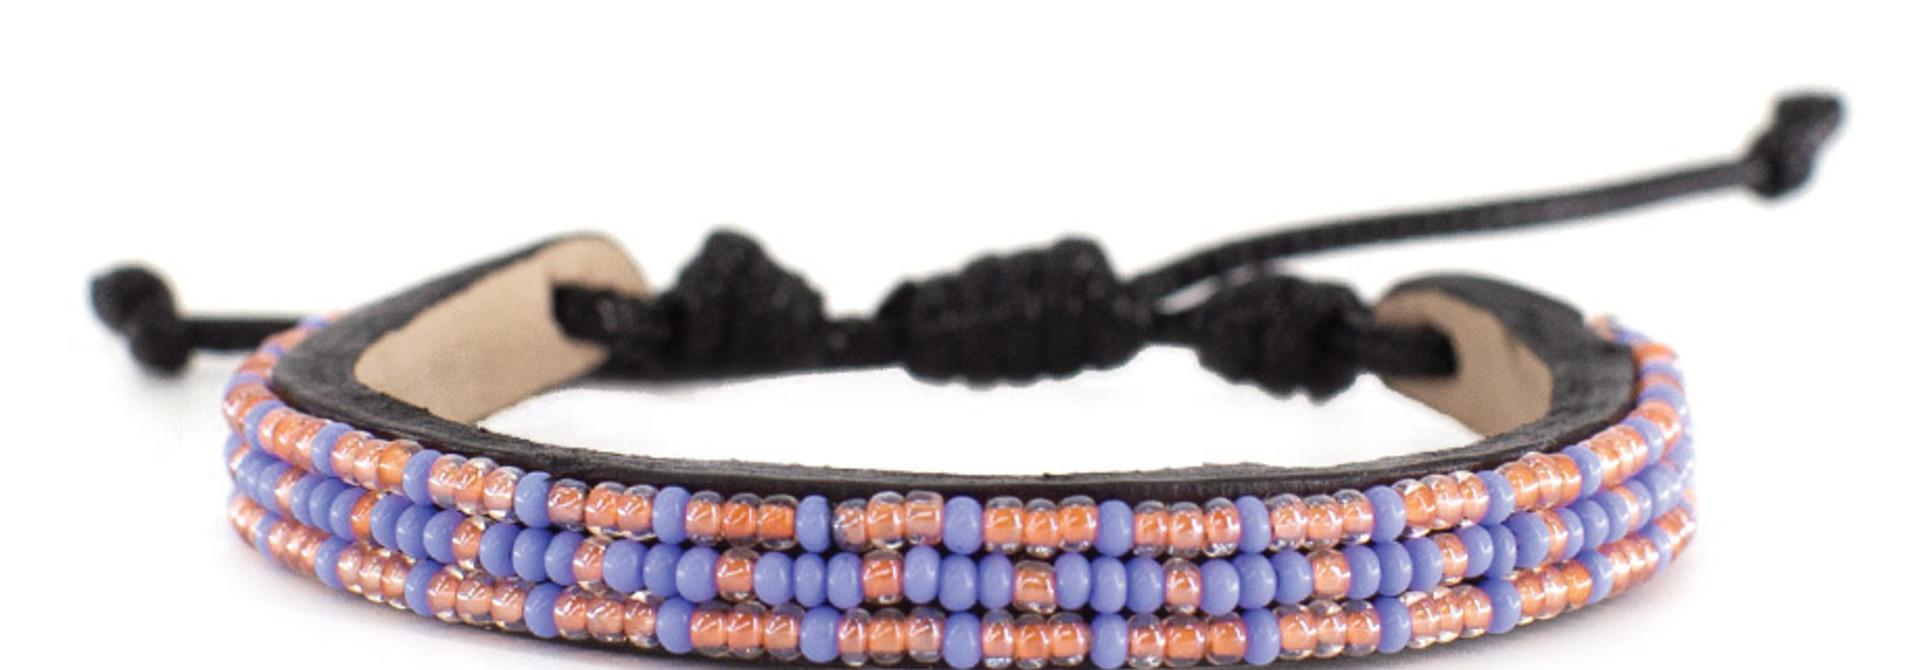 3 row Msalaba Bracelet Pearl/Periwinkle